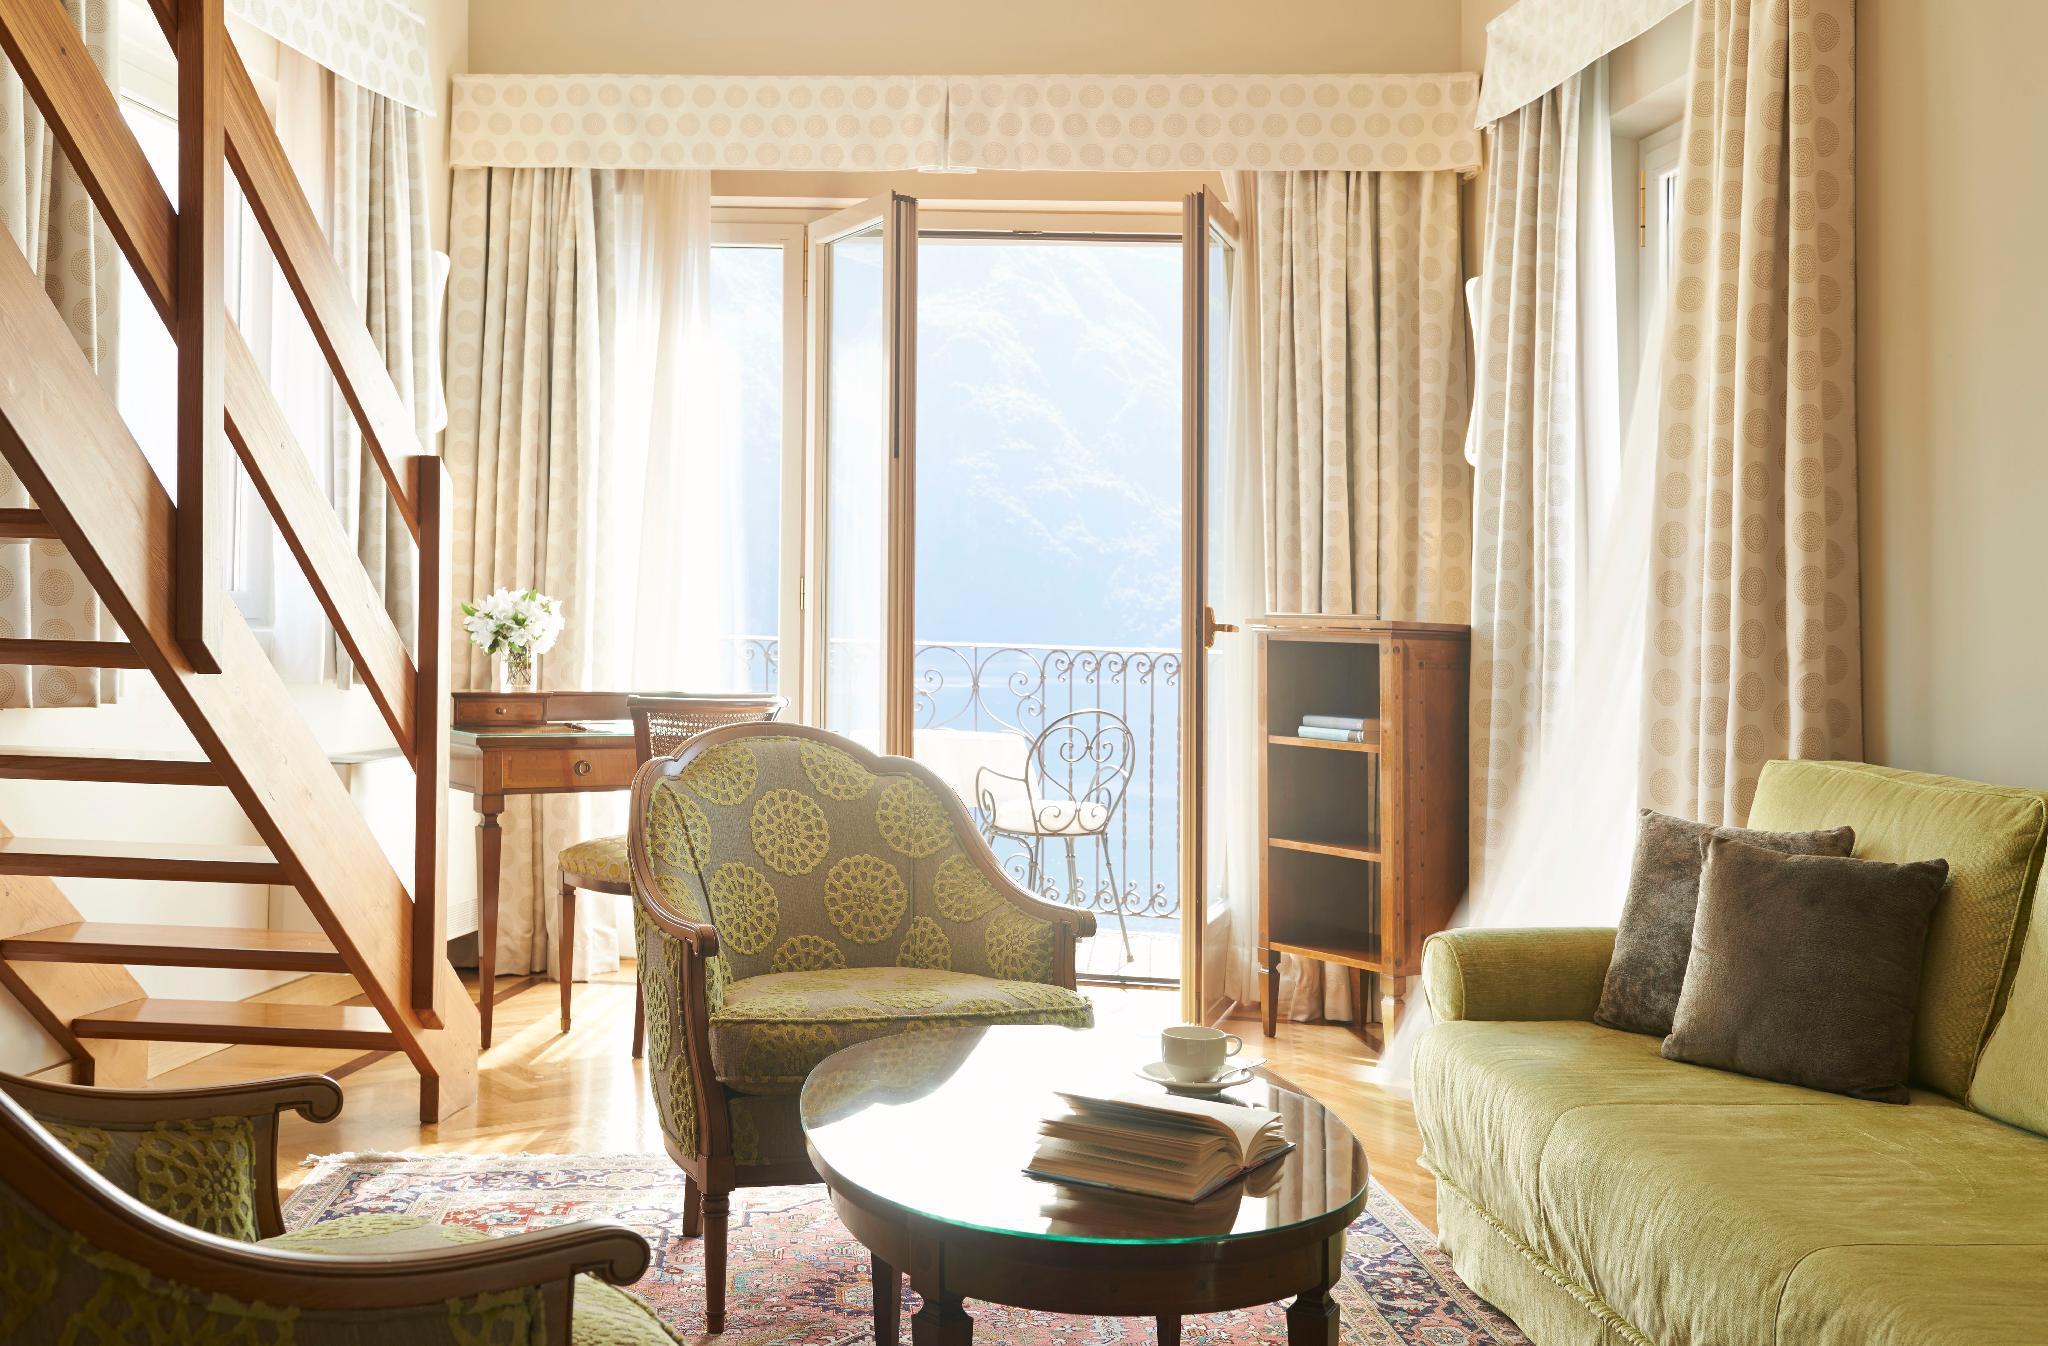 Best Price On Hotel Belvedere In Bellagio Reviews